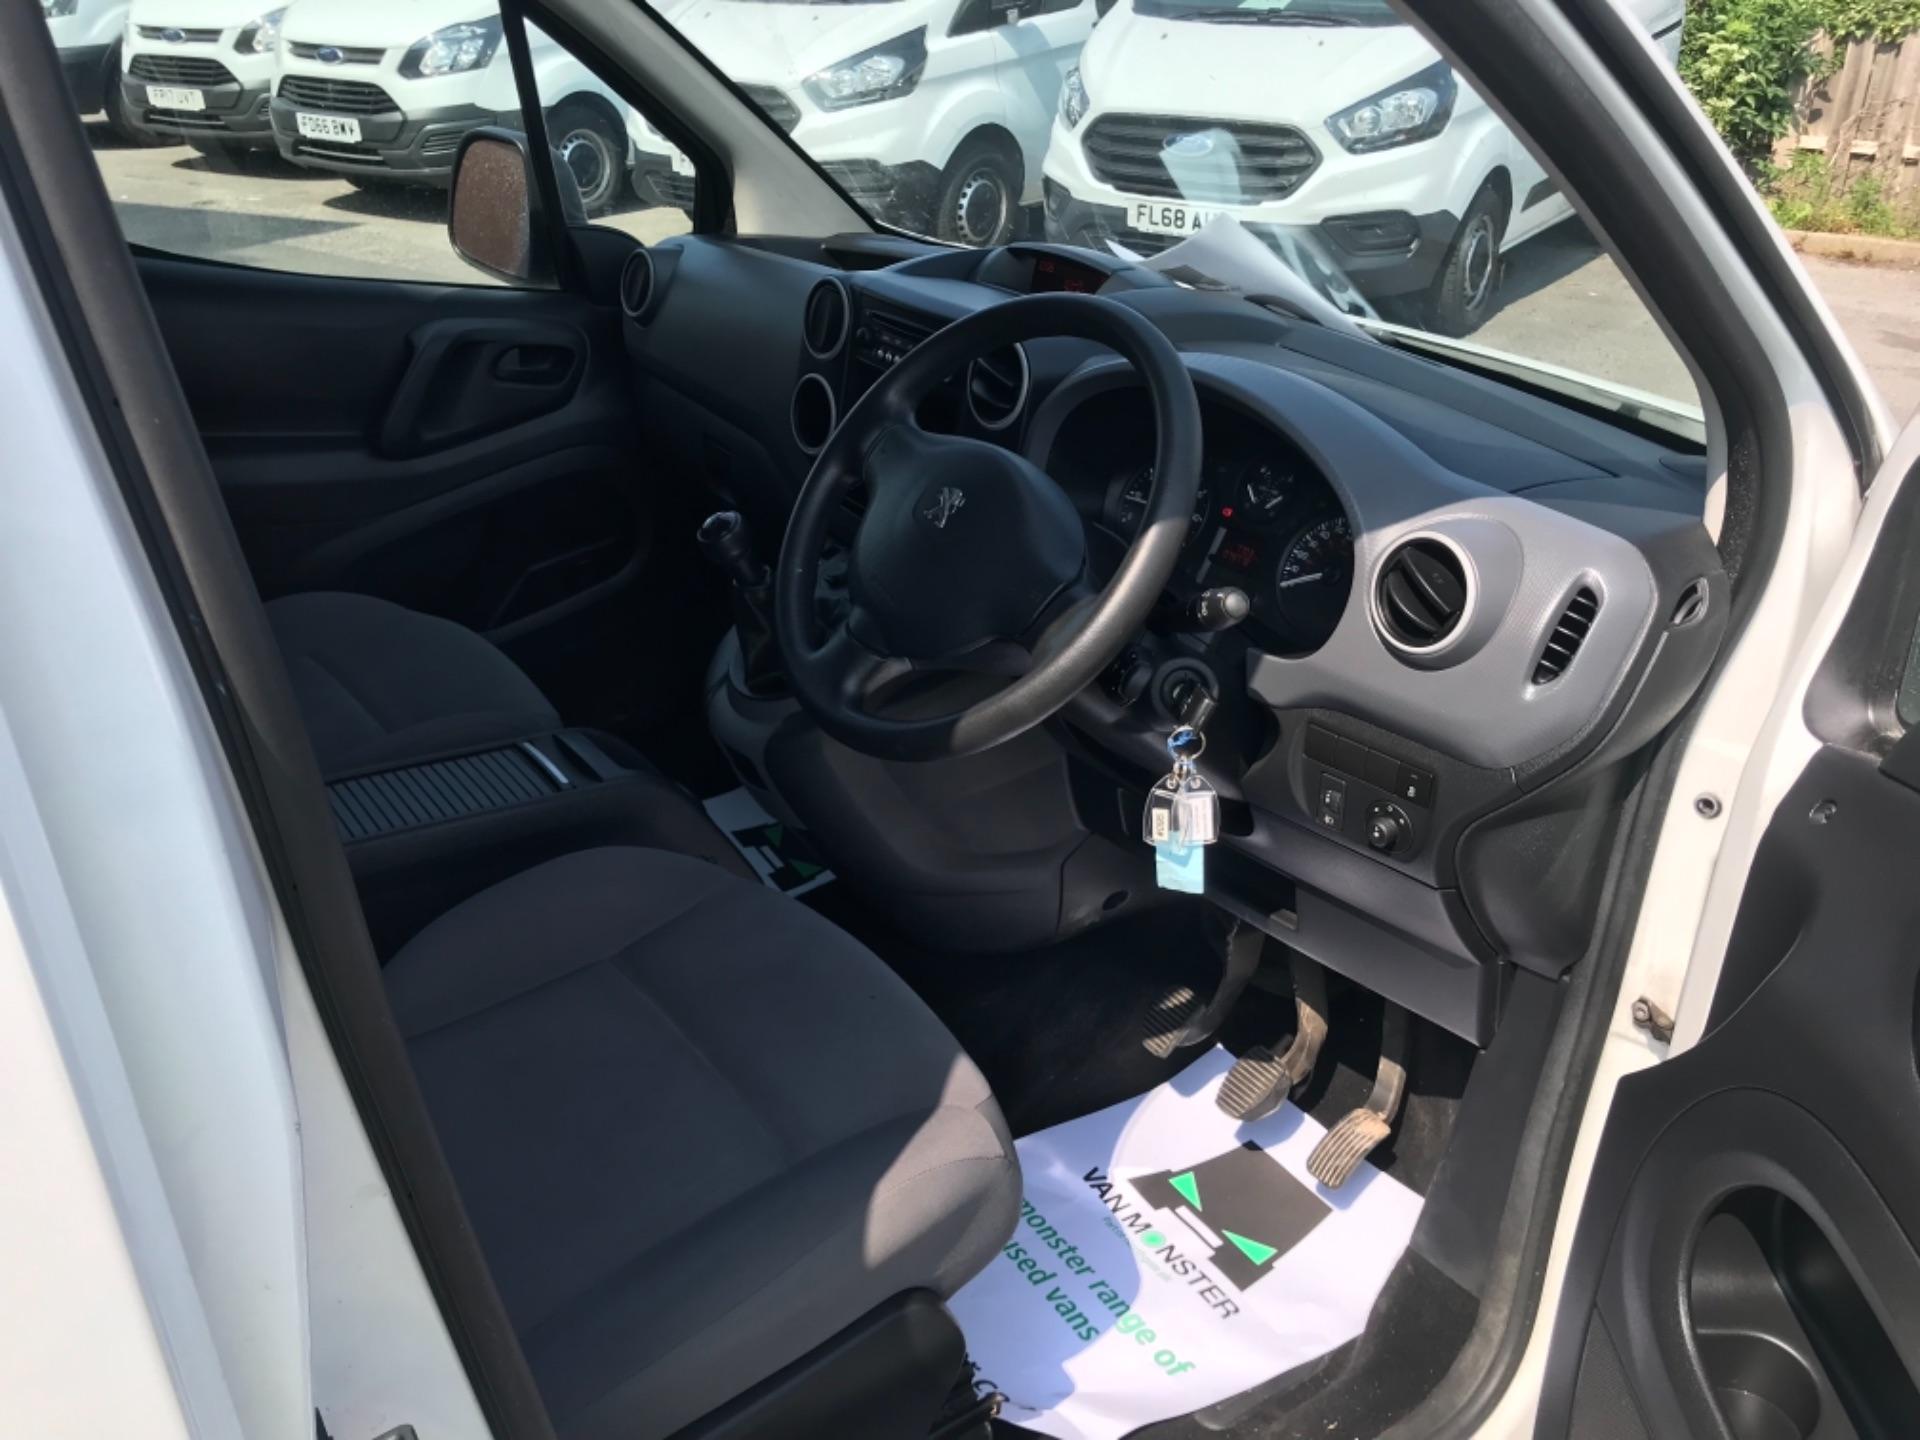 2016 Peugeot Partner L2 715 S 1.6 92PS CREW VAN EURO 5 (NU16HDN) Image 12